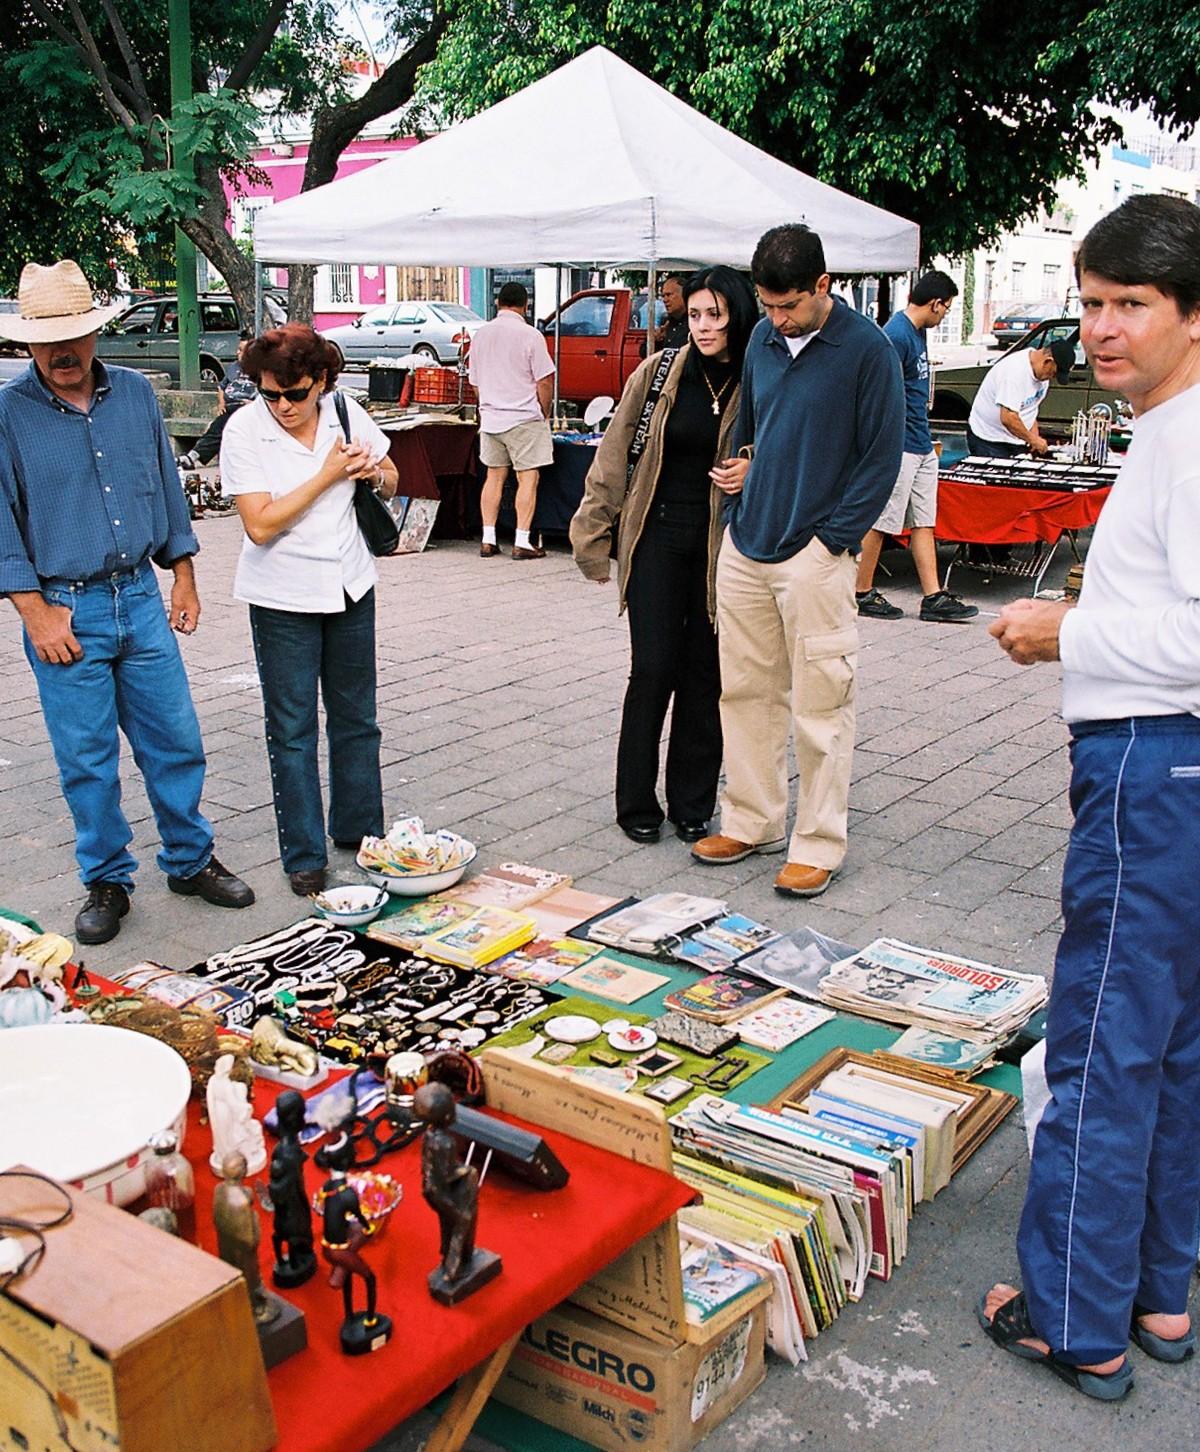 Guadalajara's Antique Market